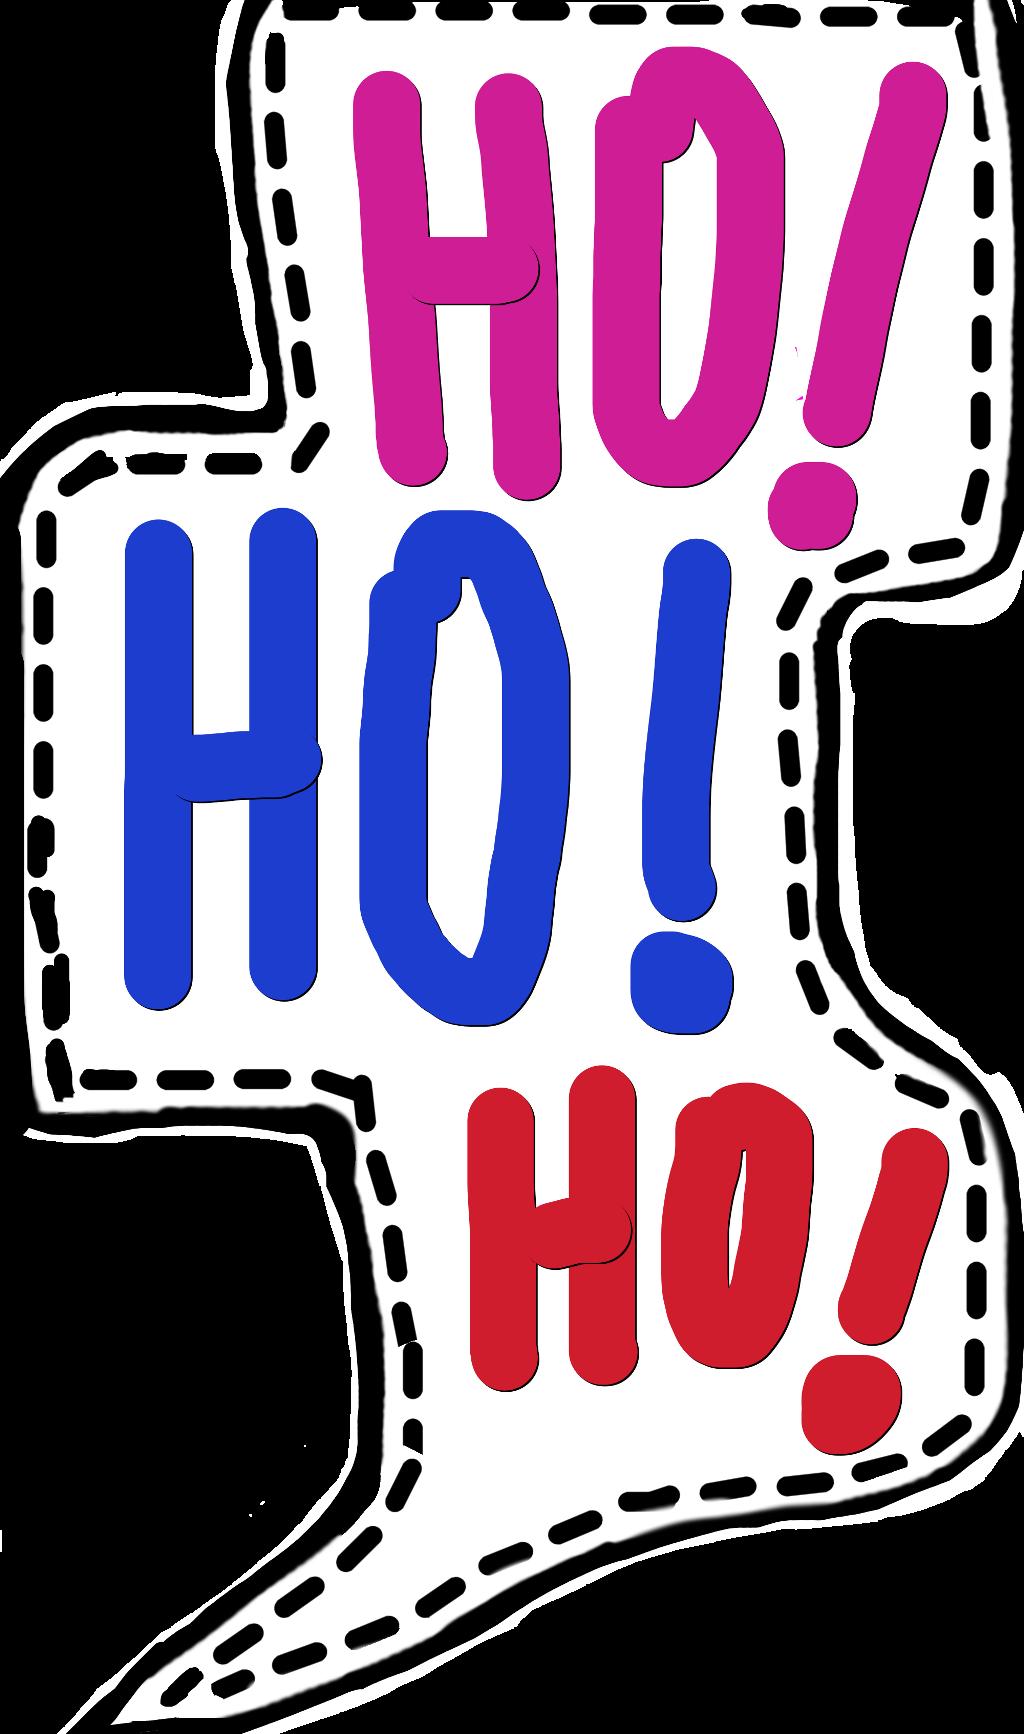 #hohoho #thoughtbubble @laura60190123  #scthoughtbubble #thoughtbubble #freetoedit